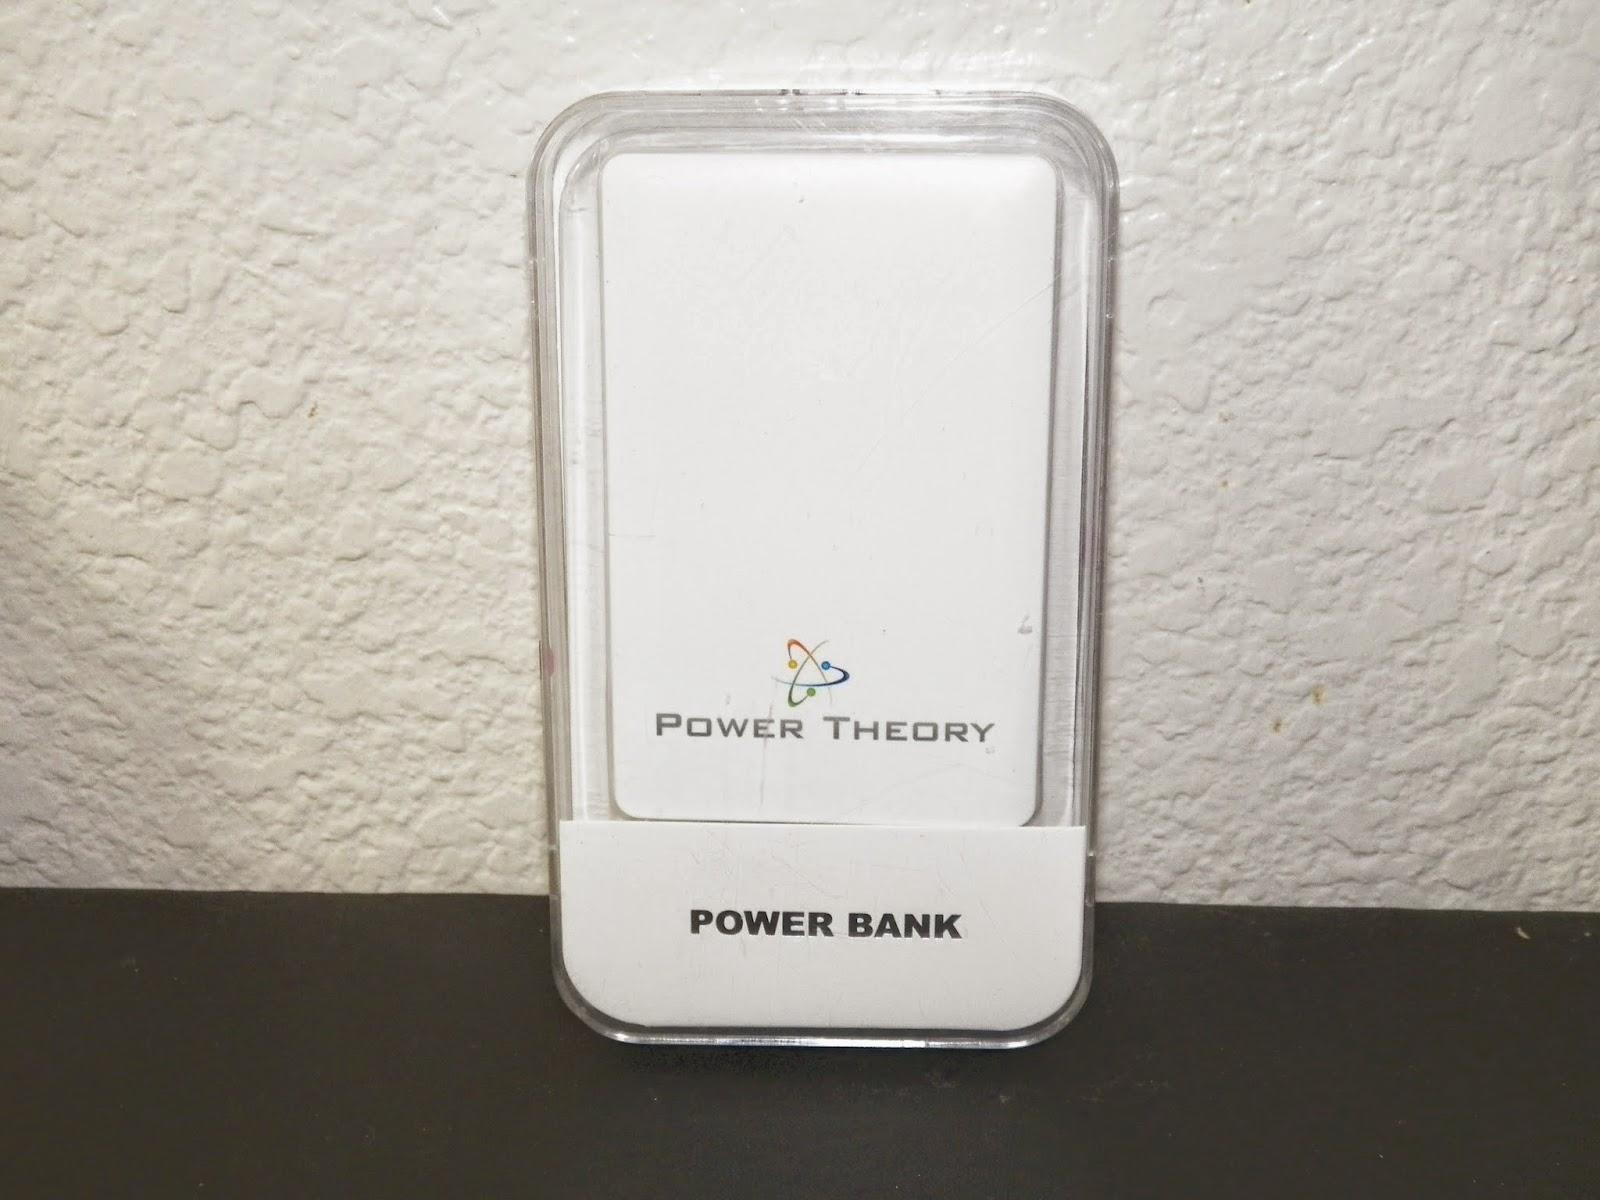 PowerTheoryPowerBank.jpg